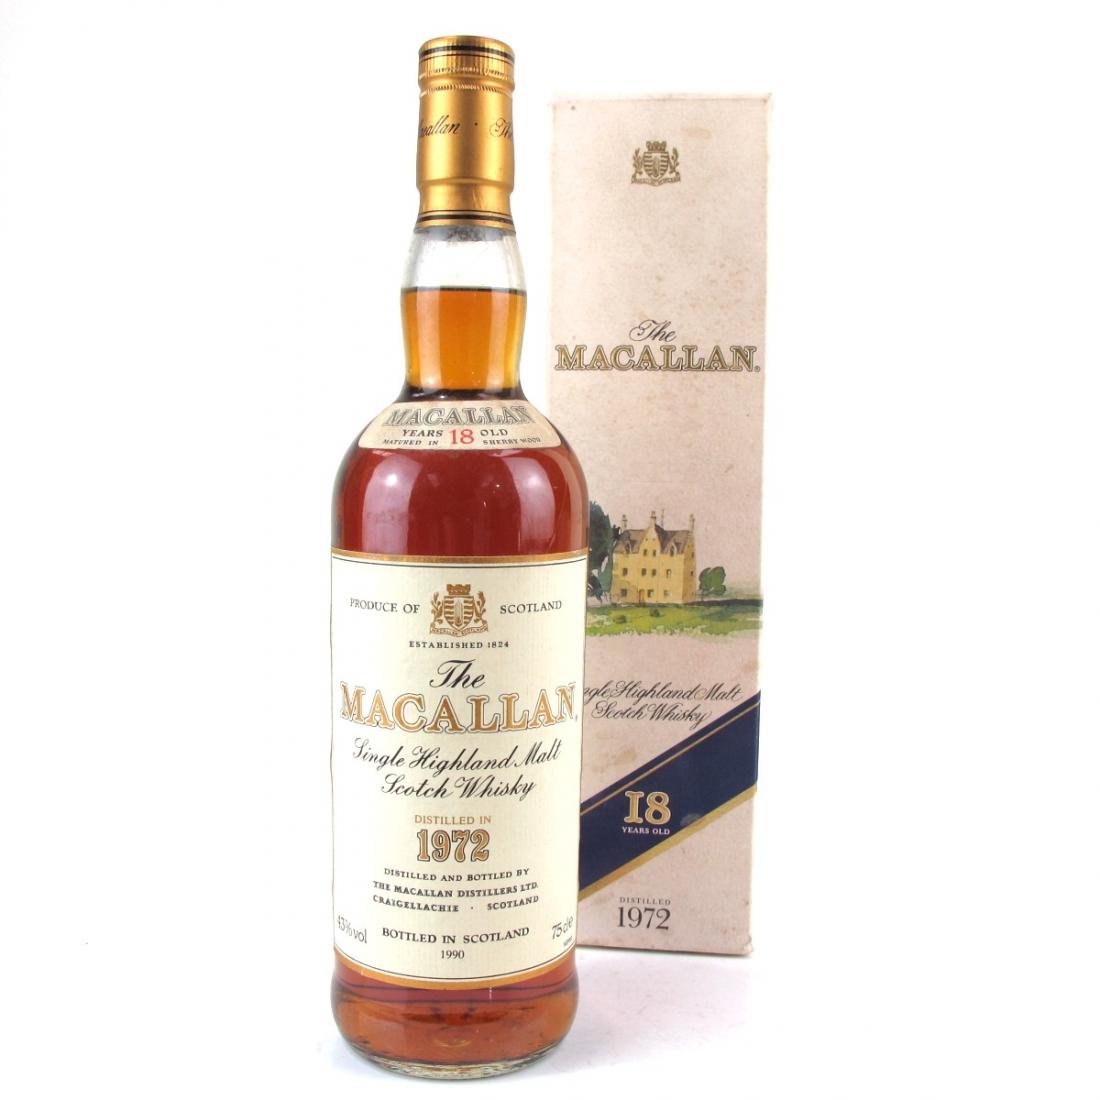 Macallan 18 Year Old 1972